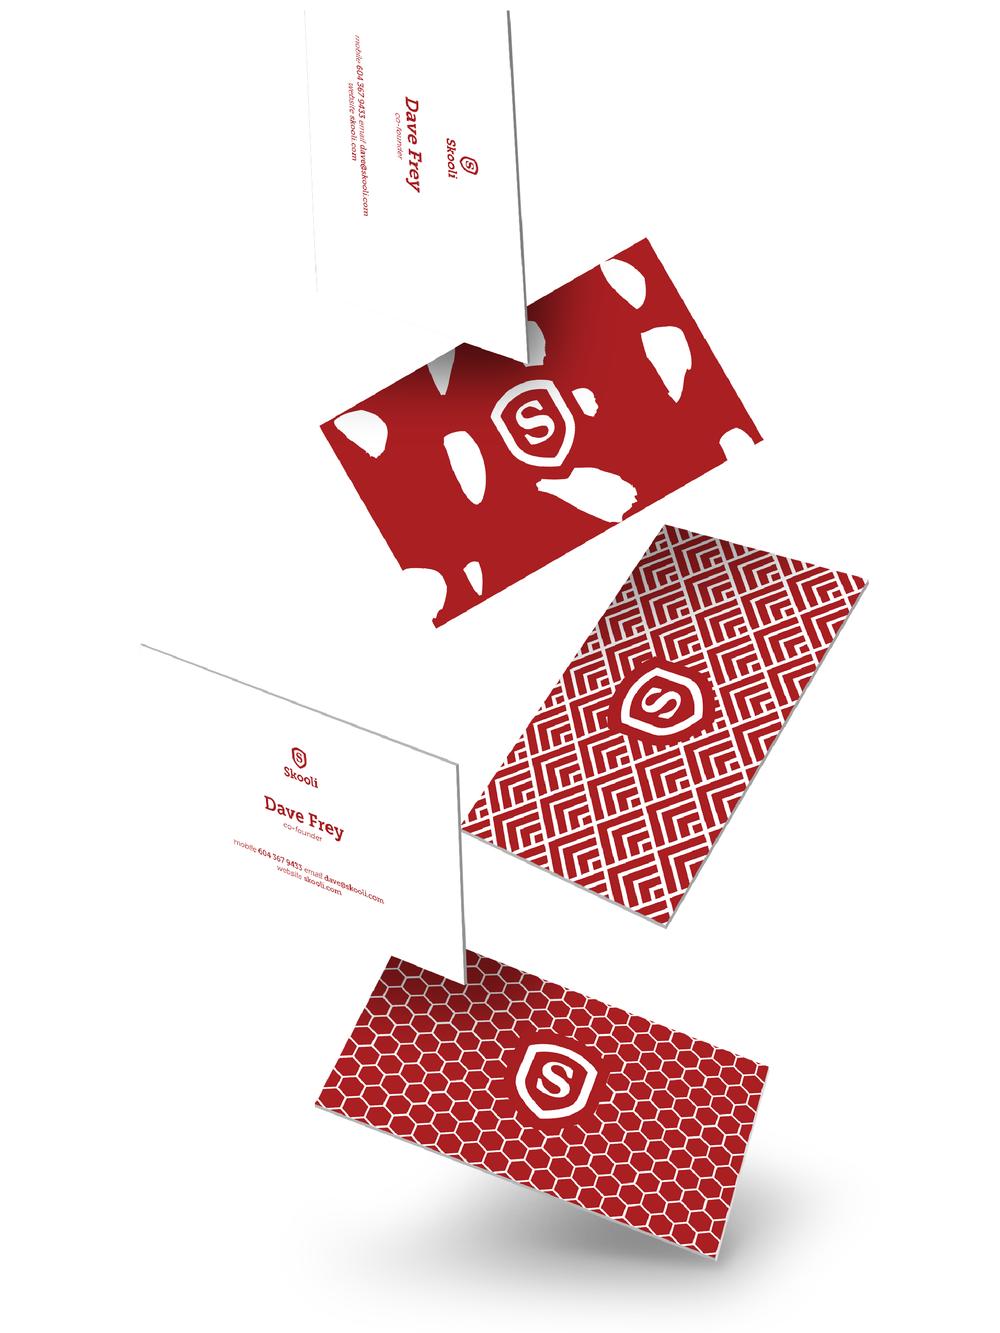 Skooli Logo + Business Card Design | Trout + Taylor www.troutandtaylor.com